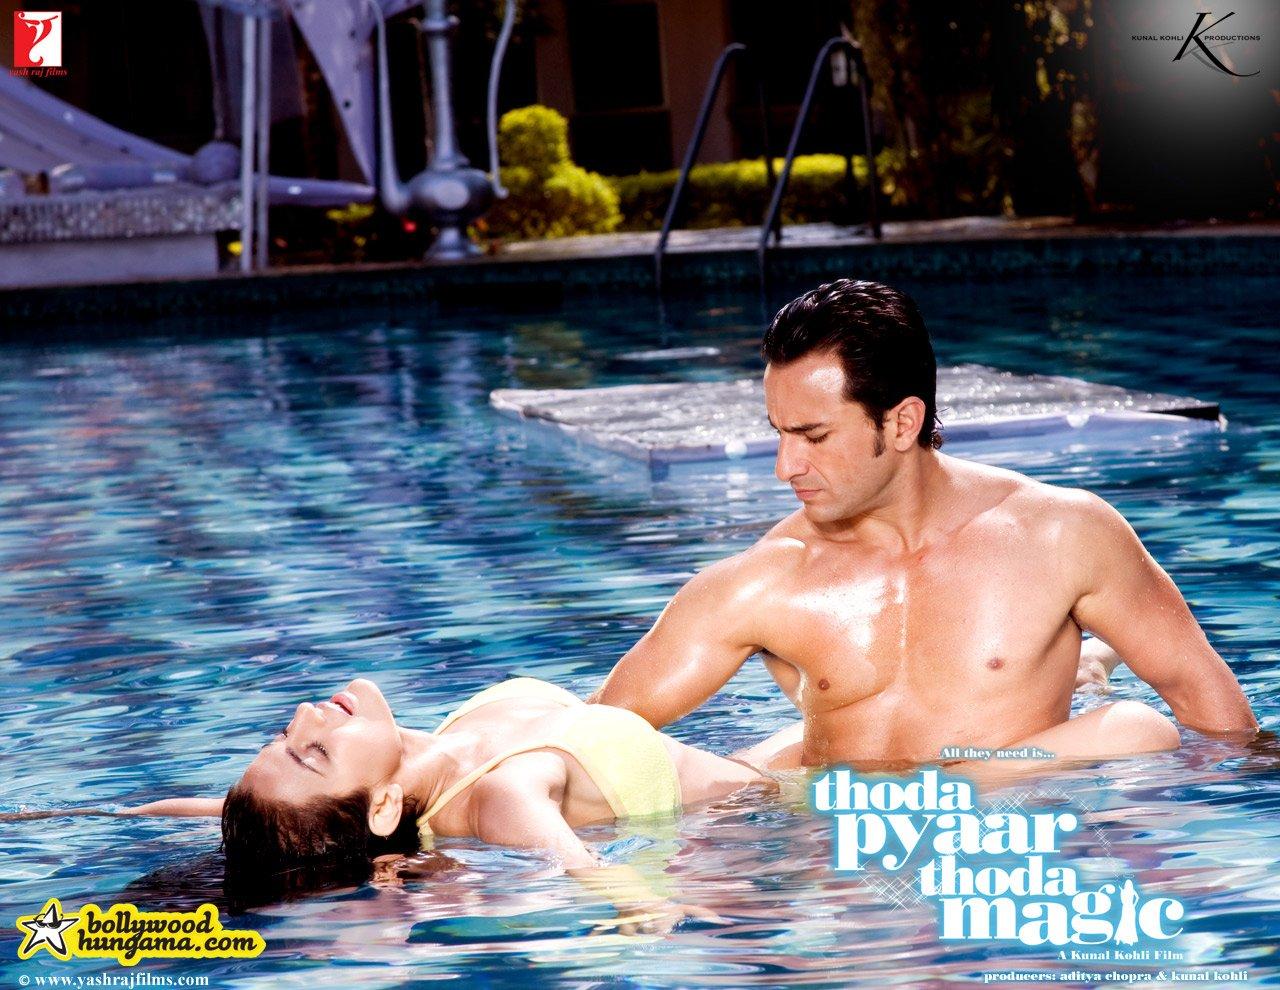 http://i.indiafm.com/posters/movies/08/thodapyaarthodamagic/still16.jpg